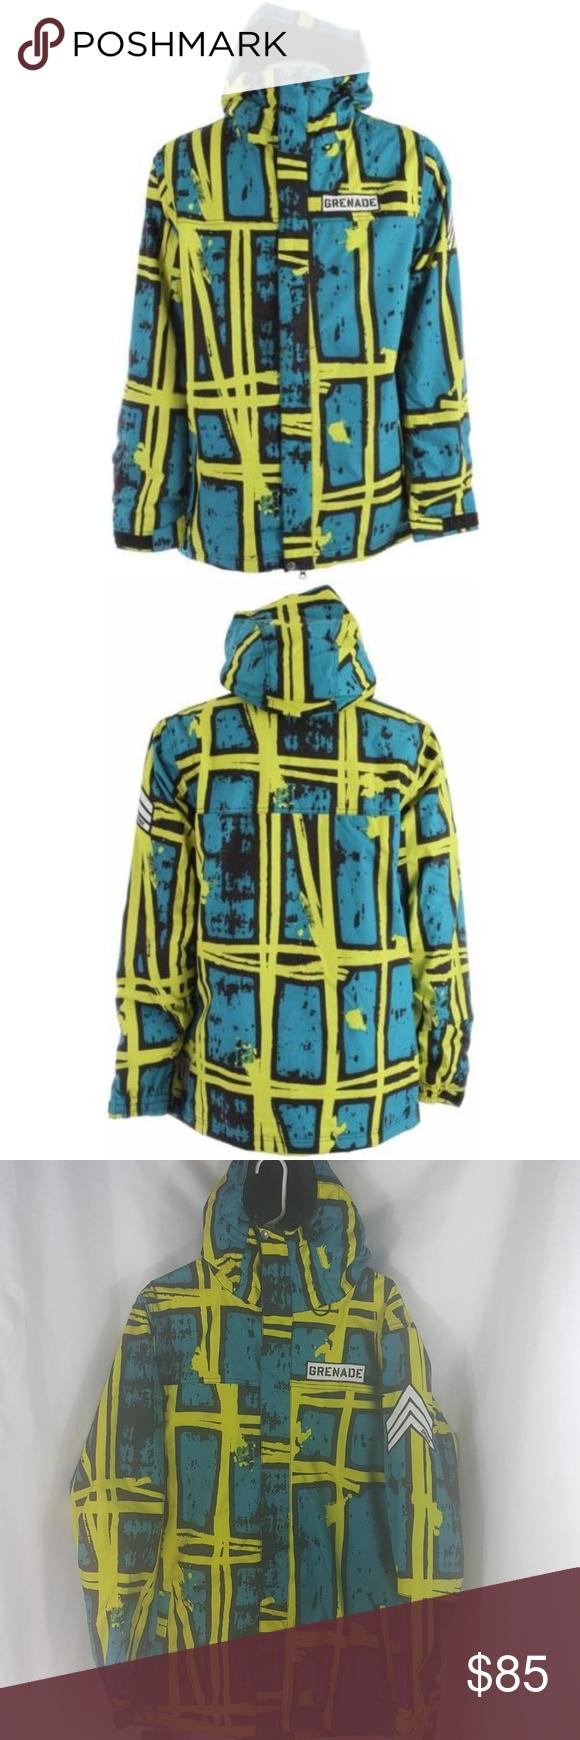 Grenade Doom Slime Blue Snowboard Ski Jacket NEW! From the